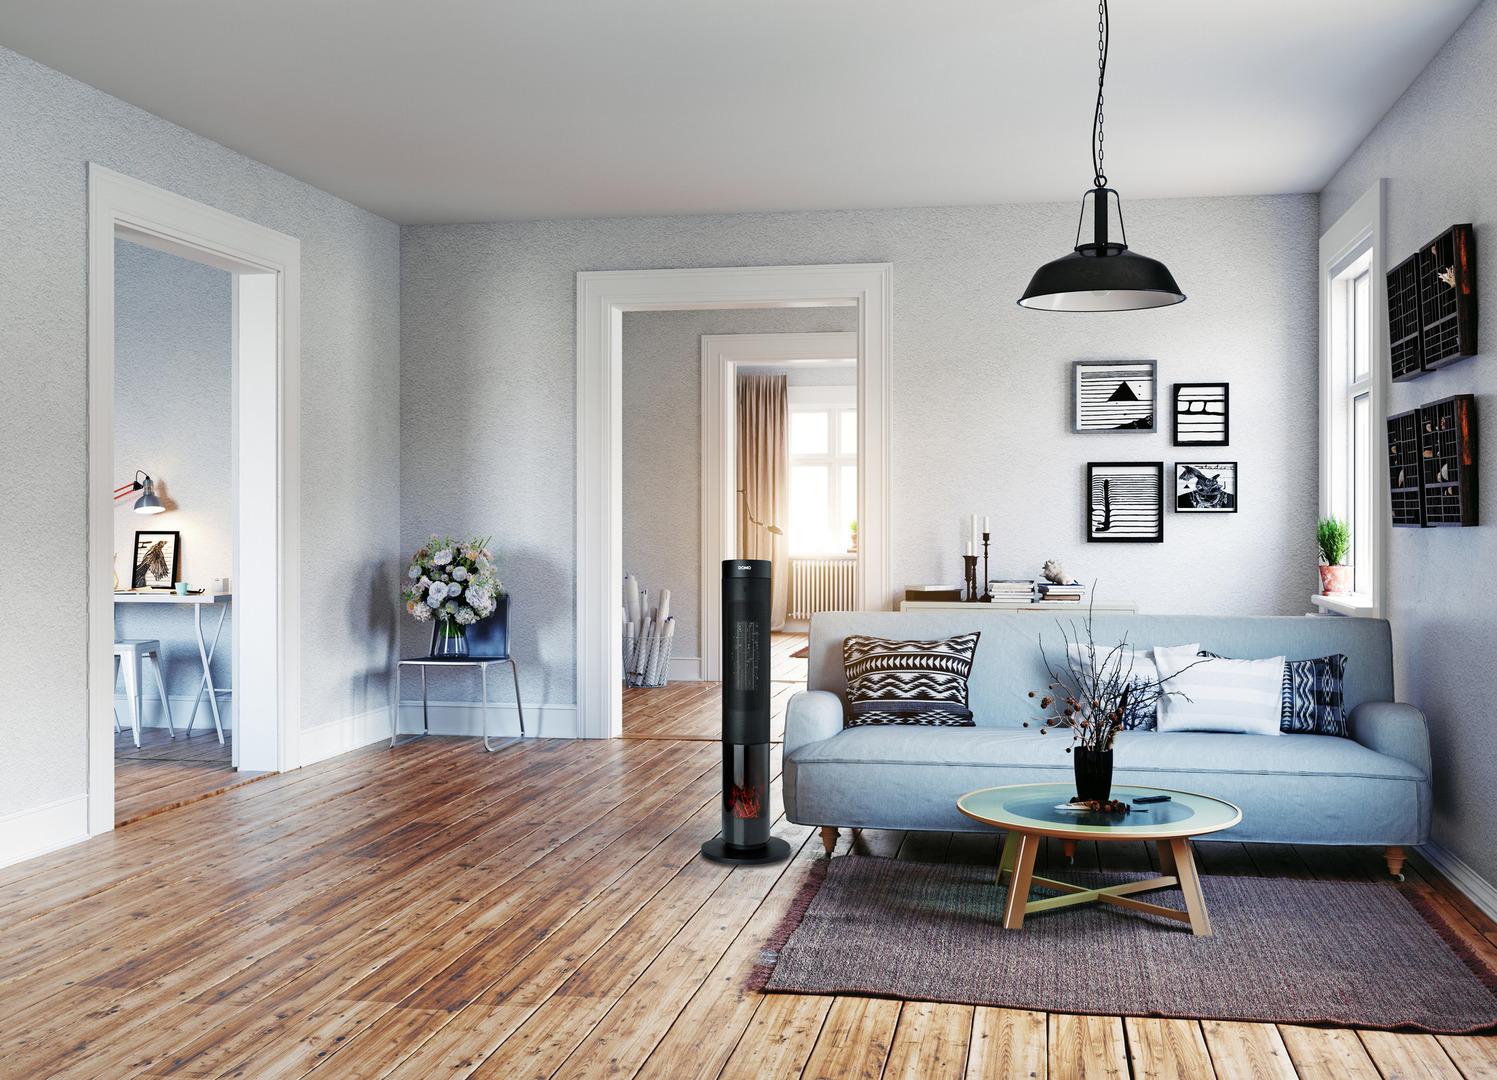 Badkamer Verwarming Domo : Domo keramische verwarming do h art craft